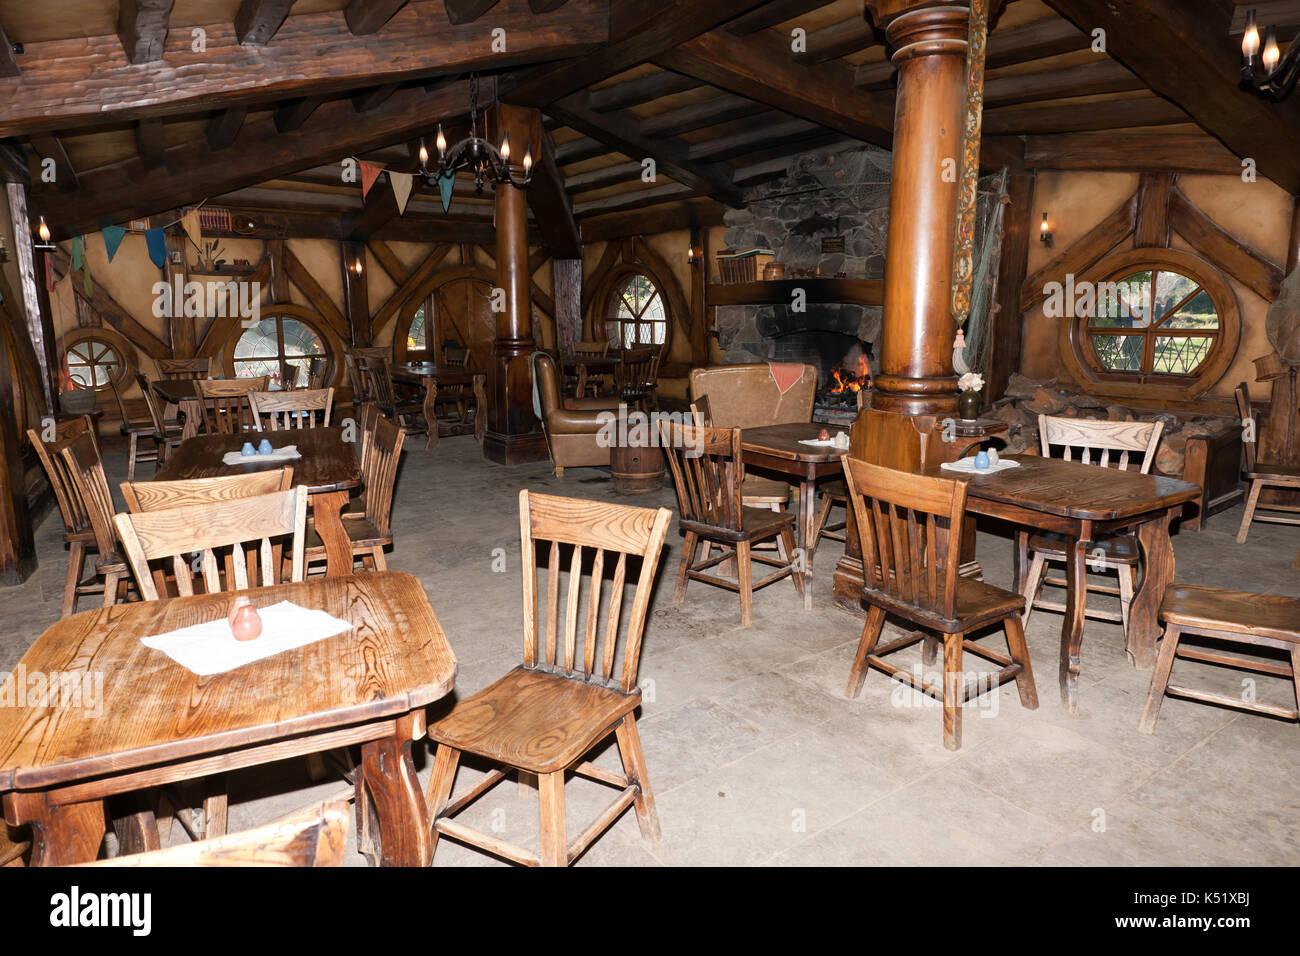 Interior view of the Green Dragon Inn, Hobbiton Movie Set Matamata, Waikato, New Zealand - Stock Image